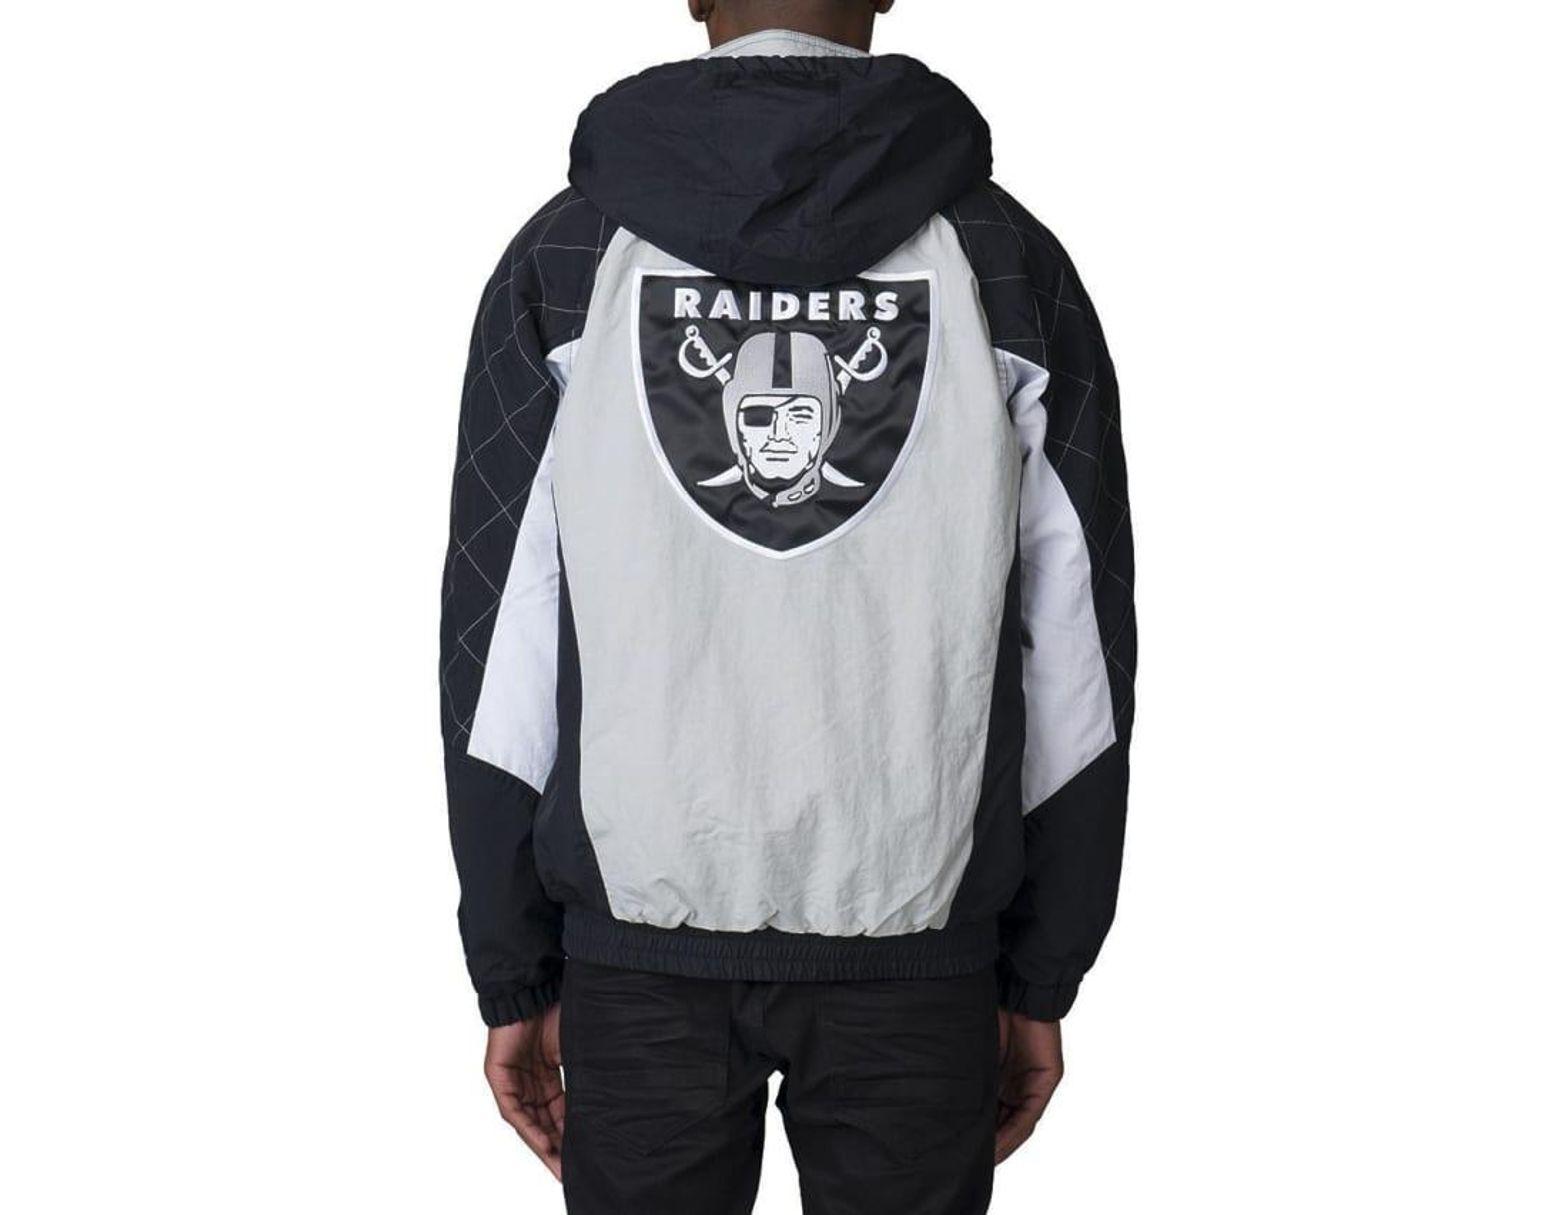 new style b76ac ece71 Men's Black Oakland Raiders Hooded Jacket